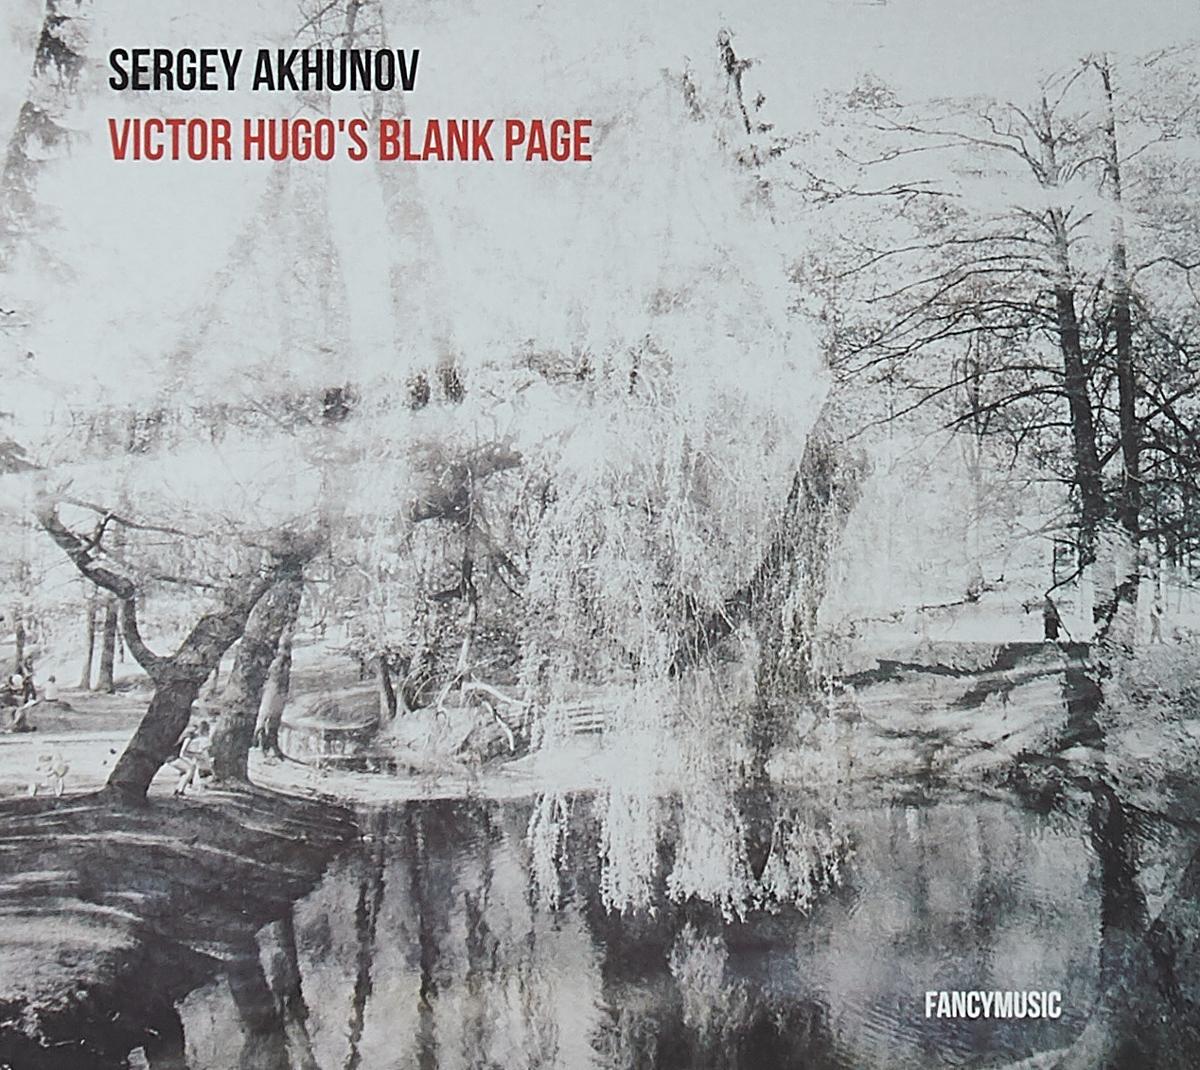 Сергей Ахунов Сергей Ахунов. Victor Hugo's Blank Page (2 CD) cosonic cd 609mv page 5